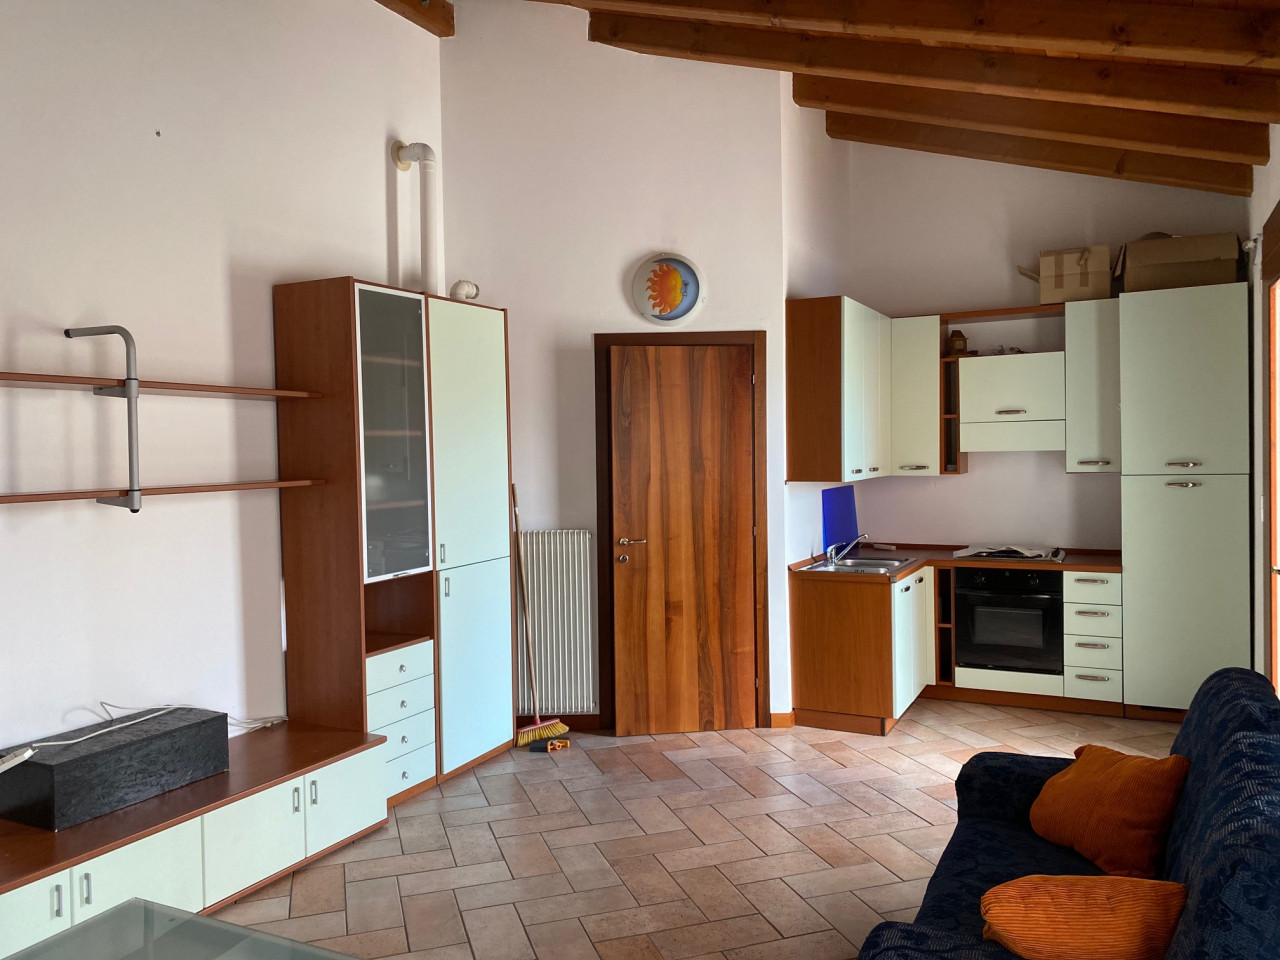 monolocale in affitto a Valvasone - Rif. - A8Aff https://media.gestionaleimmobiliare.it/foto/annunci/200619/2260170/1280x1280/000__img_2696.jpg